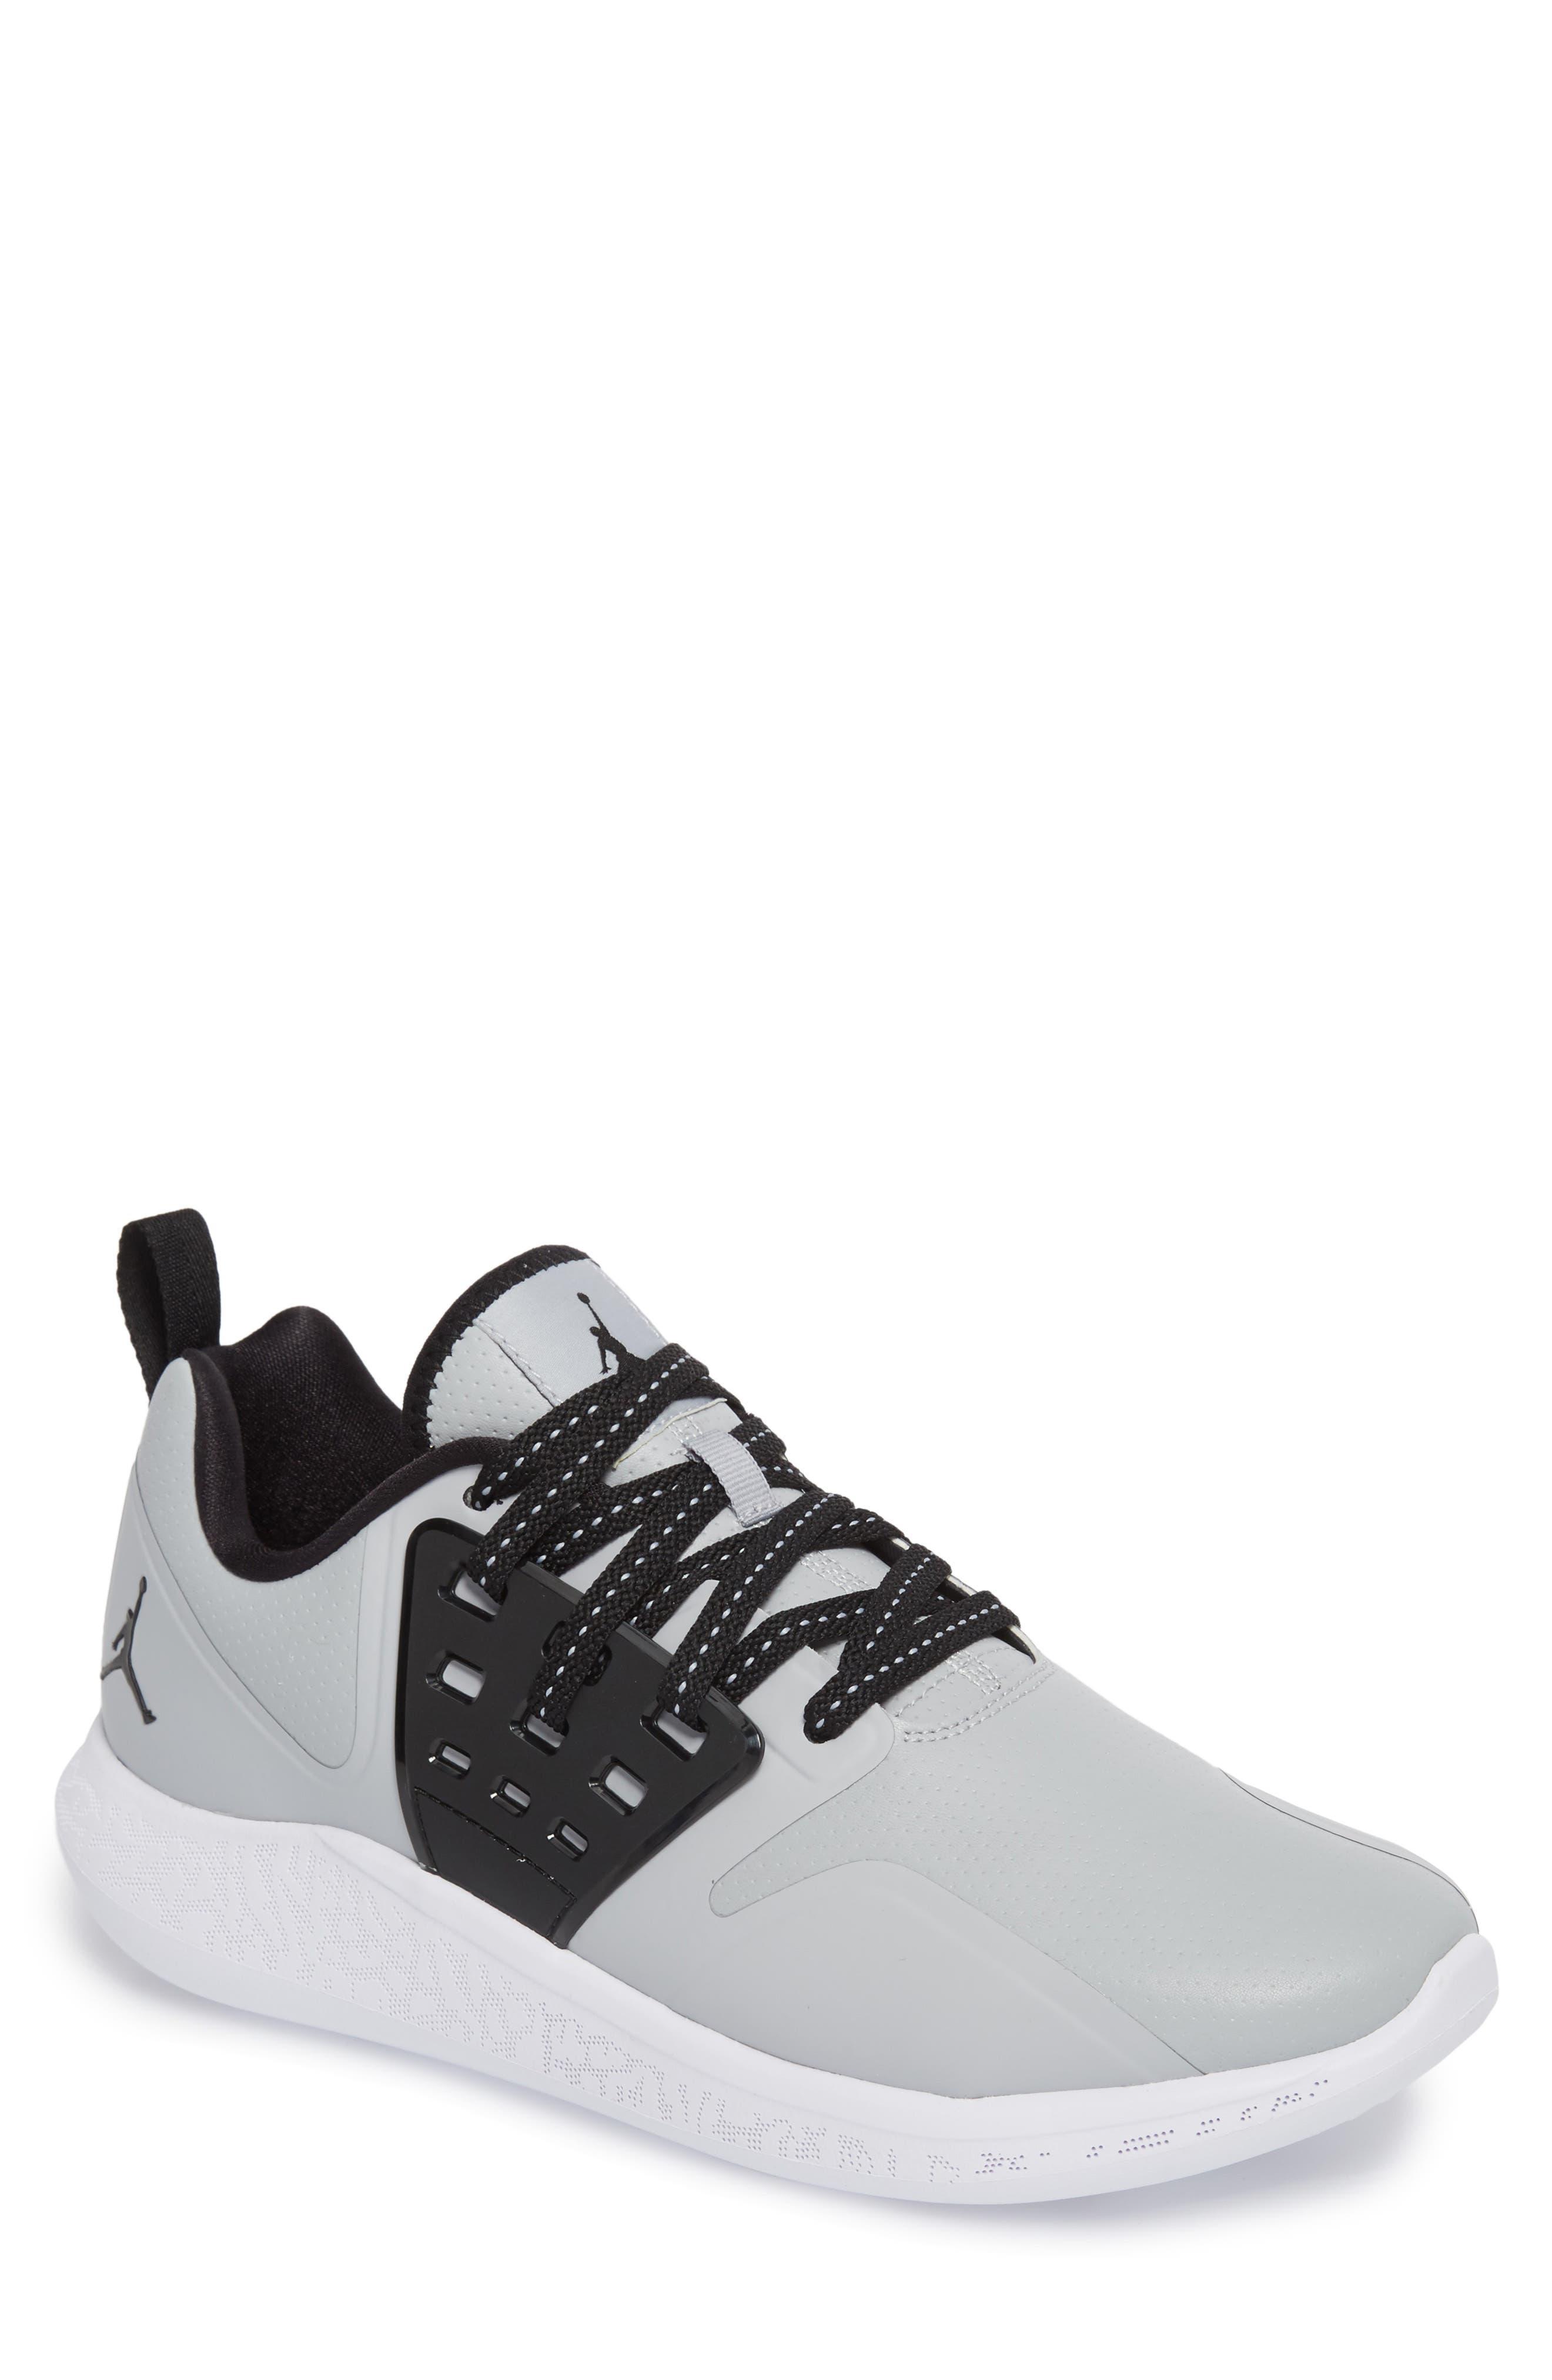 Jordan Grind Running Shoe,                             Main thumbnail 1, color,                             Wolf Grey/ Black/ White